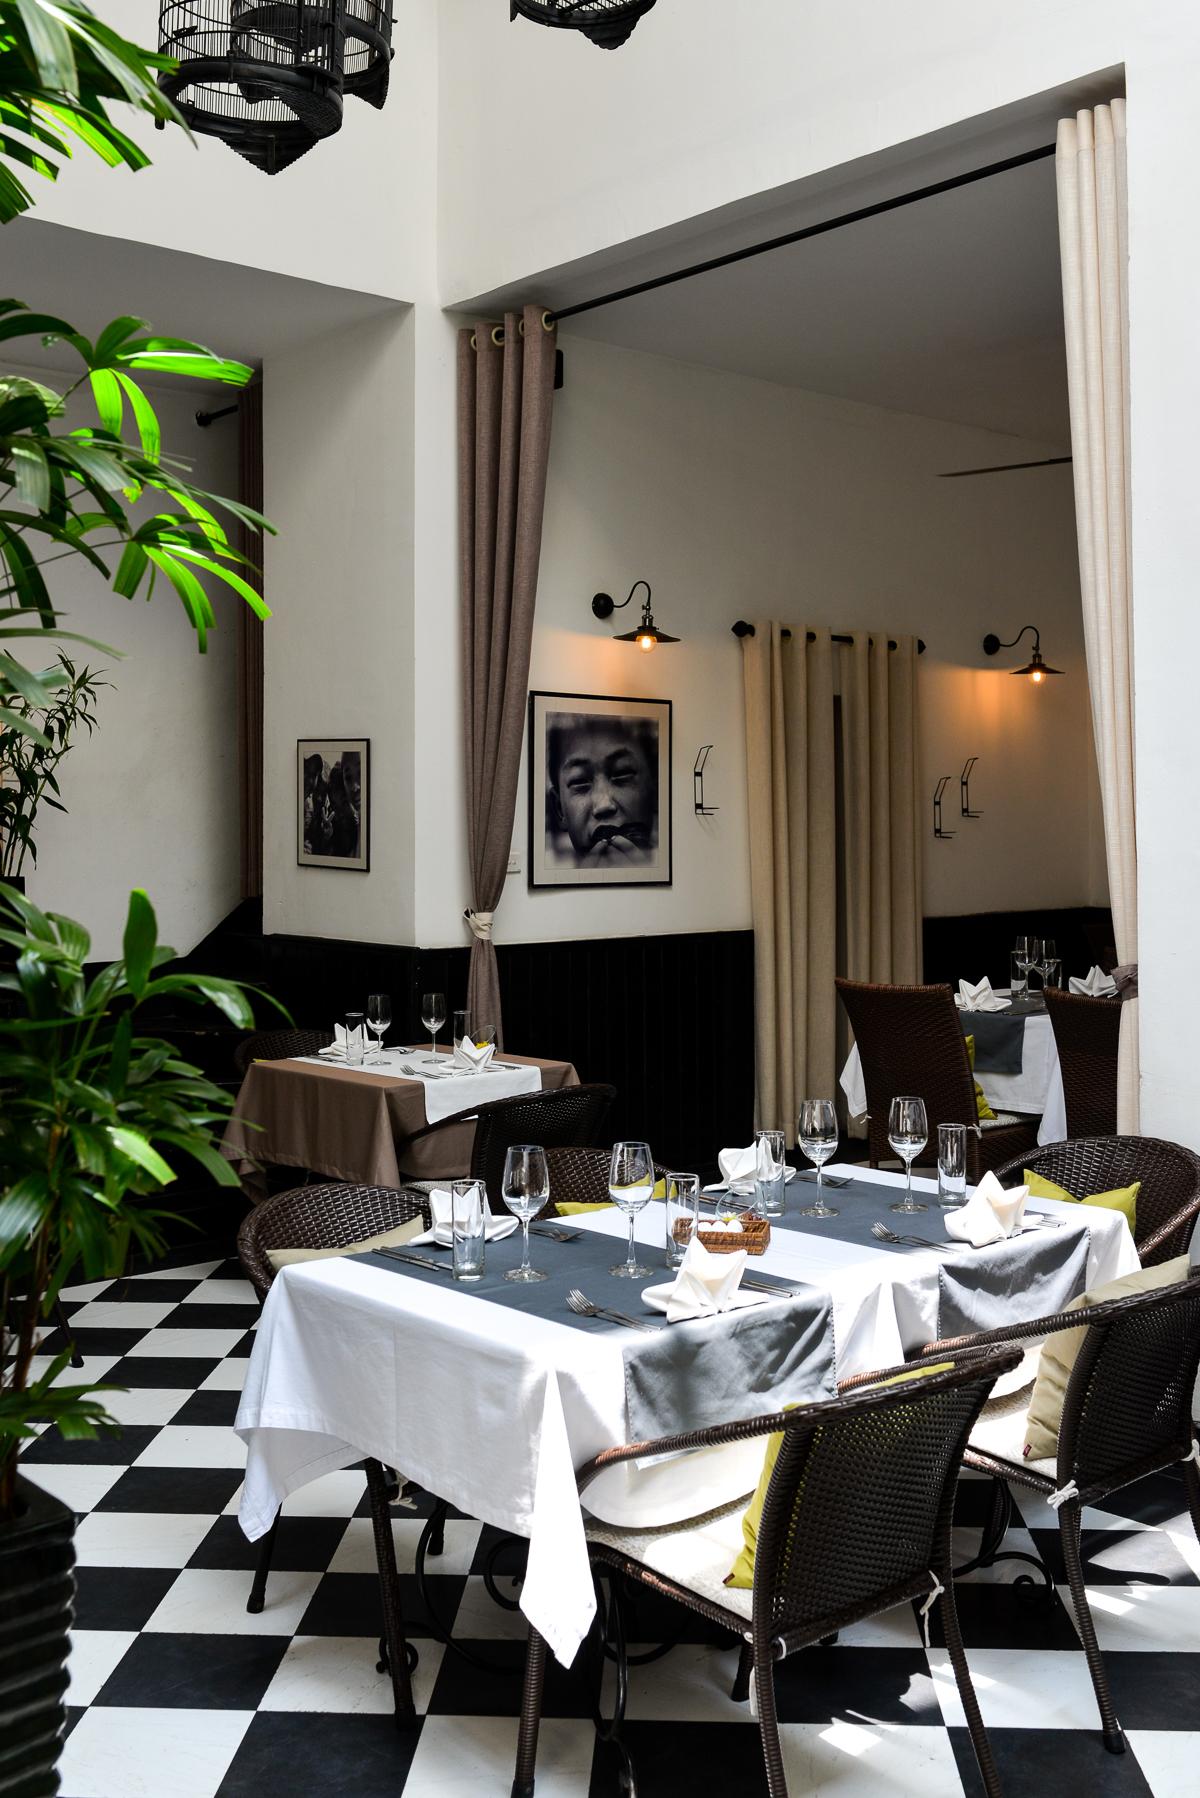 La Badiane Restaurant in Hanoi, Vietnam - STACIE FLINNER